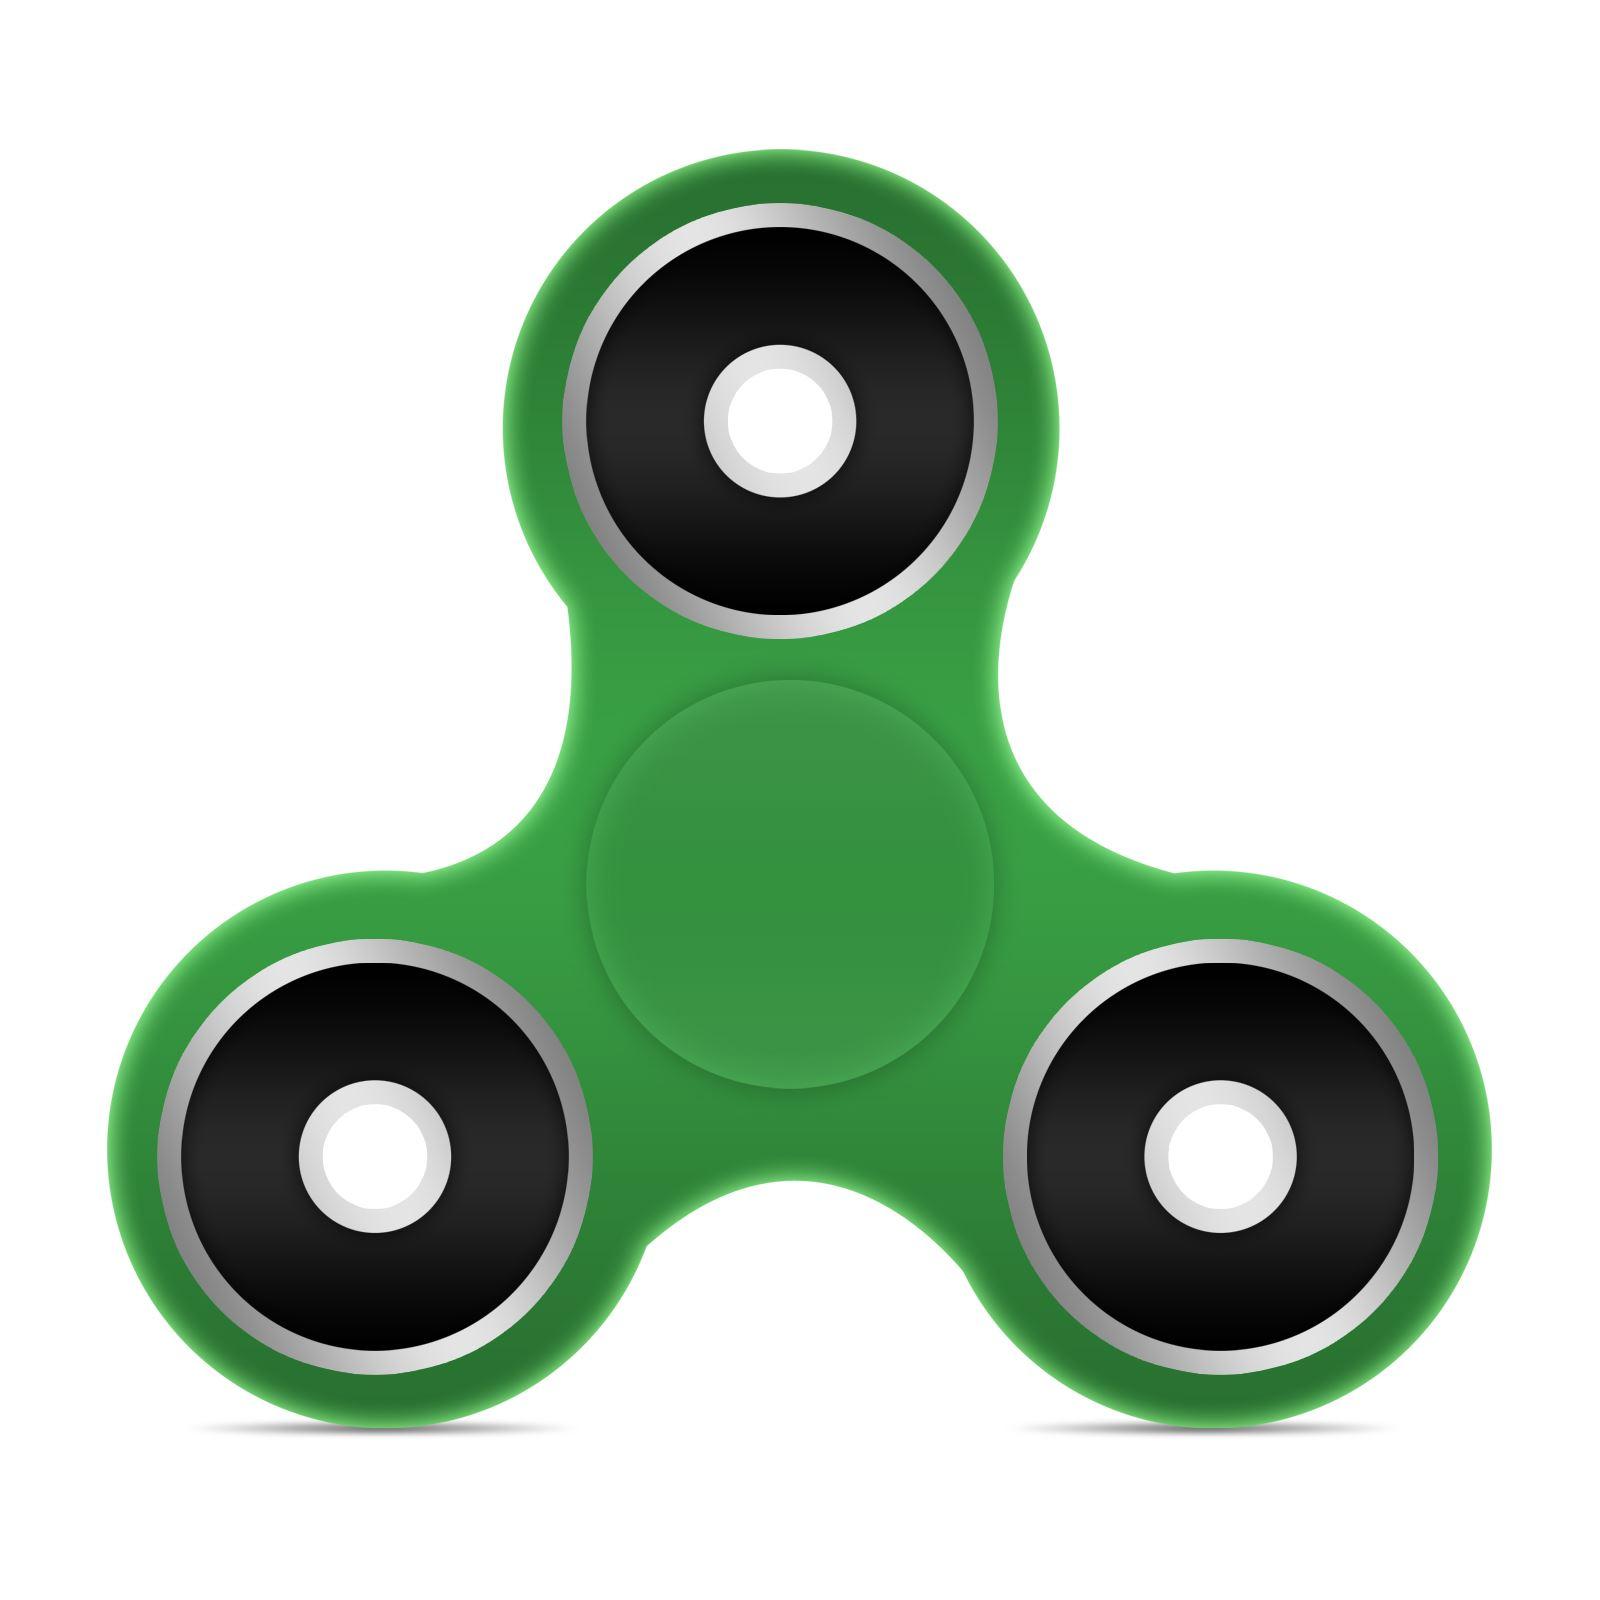 Tri-Fidget-Spinner-Hand-Finger-Stress-Toy-Pocket-